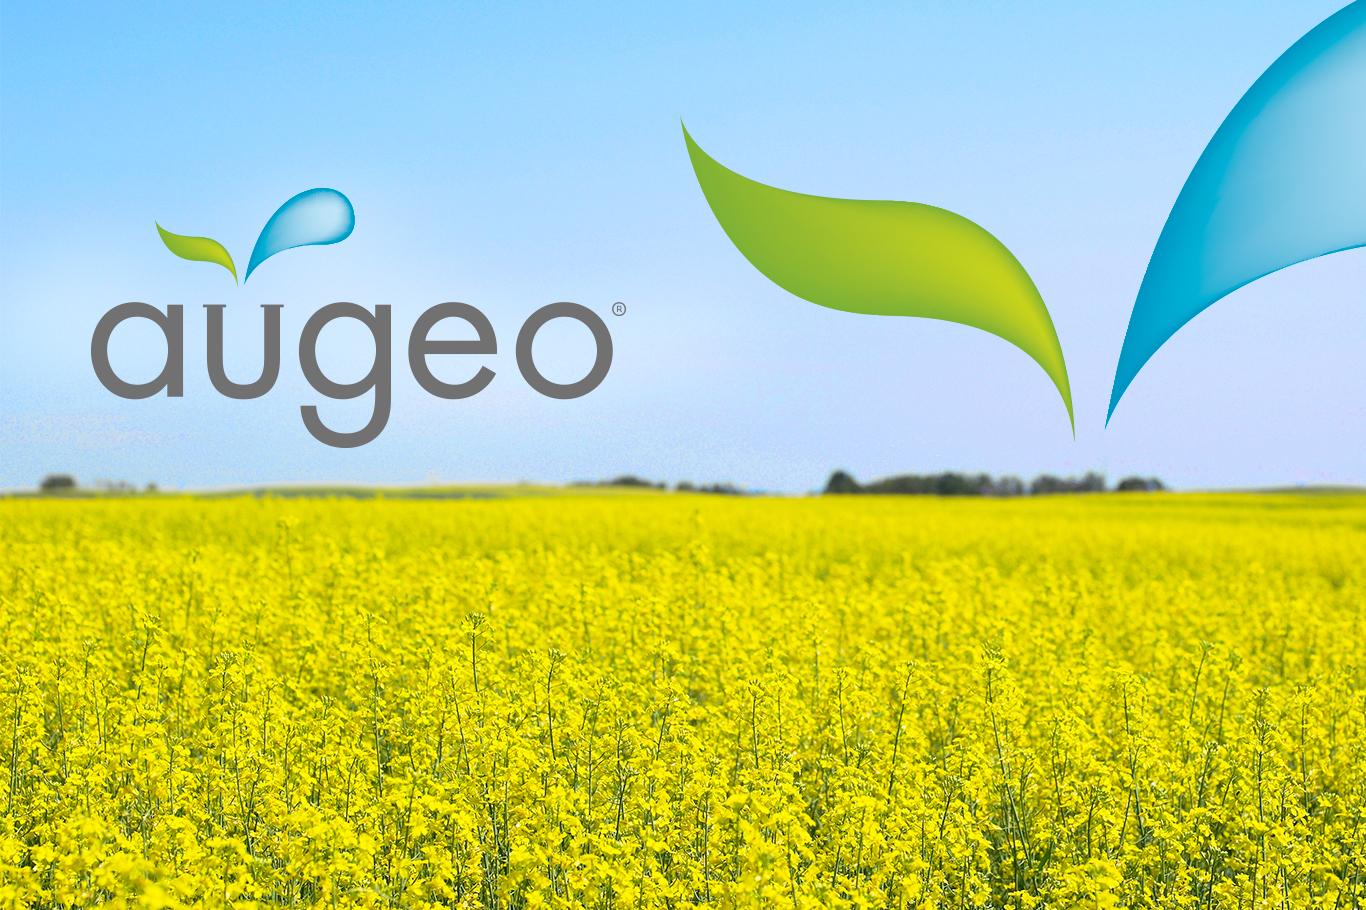 augeo-banner